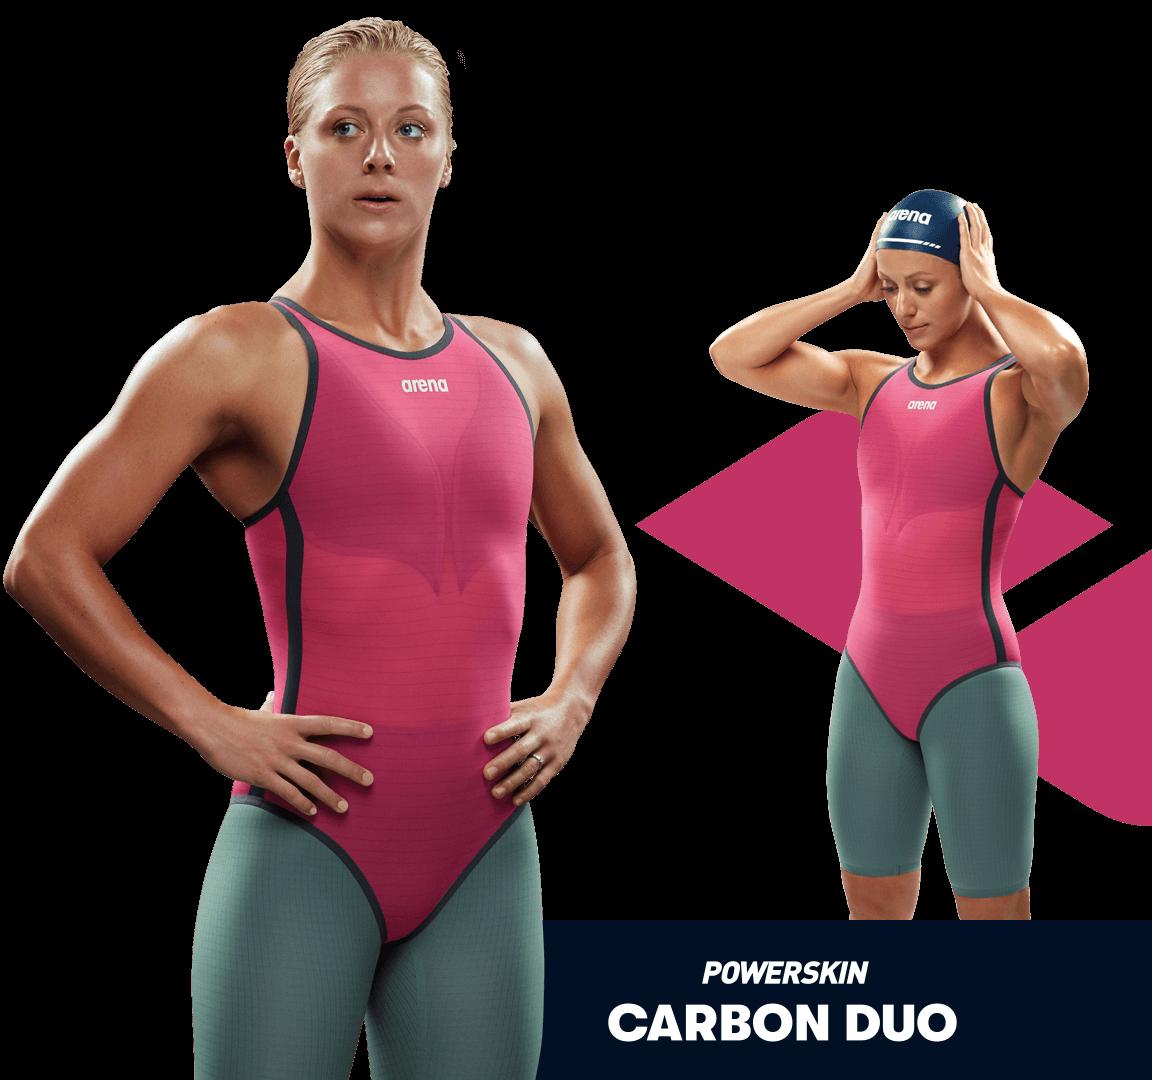 arena Powerskin Carbon Duo race suit